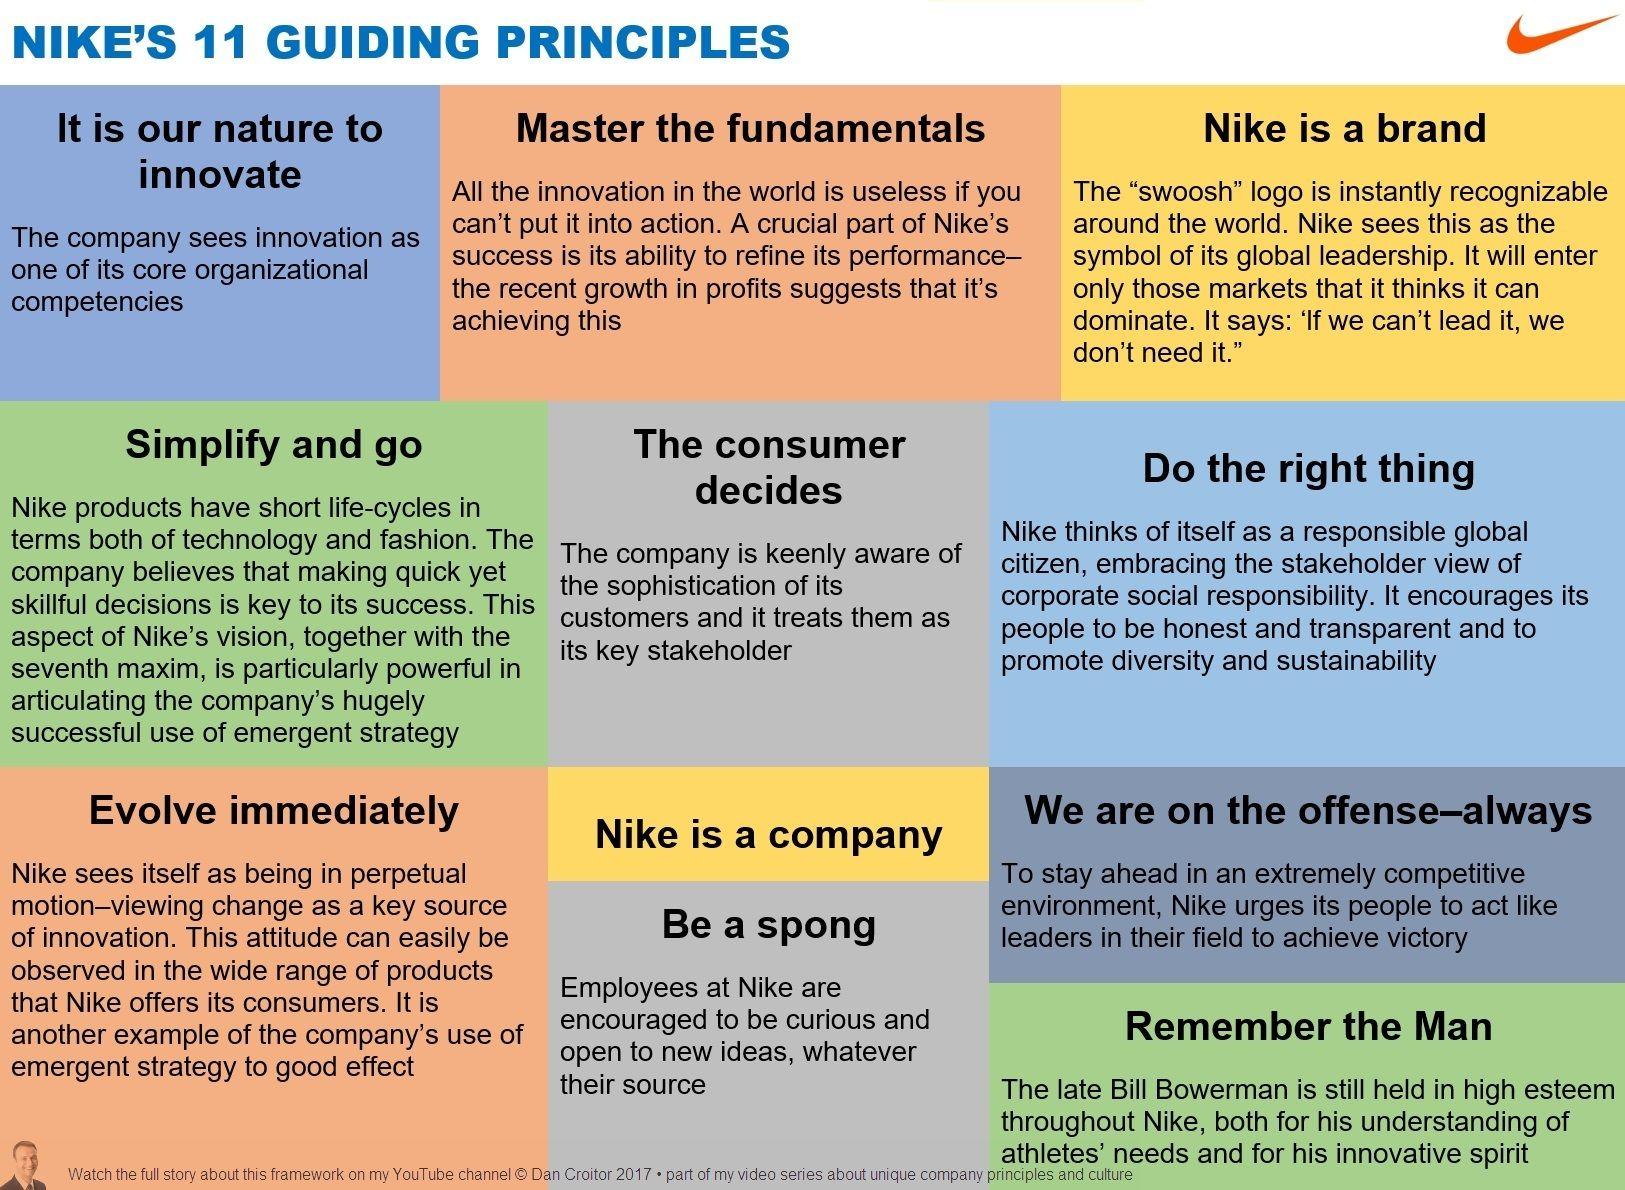 Necesitar riesgo Poder  nike's 11 guiding principles | Leadership development, Company culture,  Core values